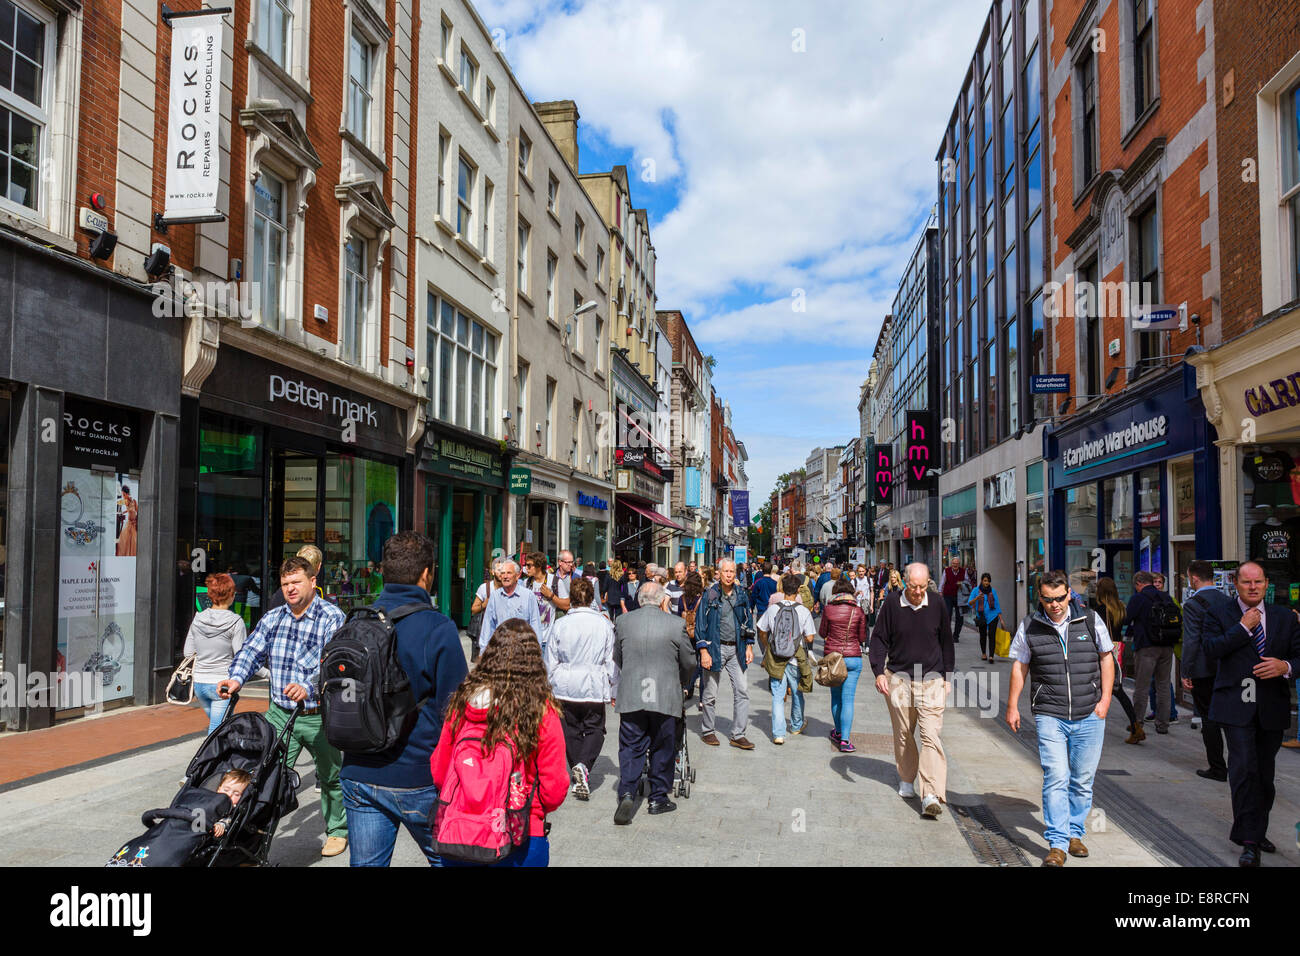 Shops on Grafton Street in the city centre, Dublin City, Republic of Ireland - Stock Image